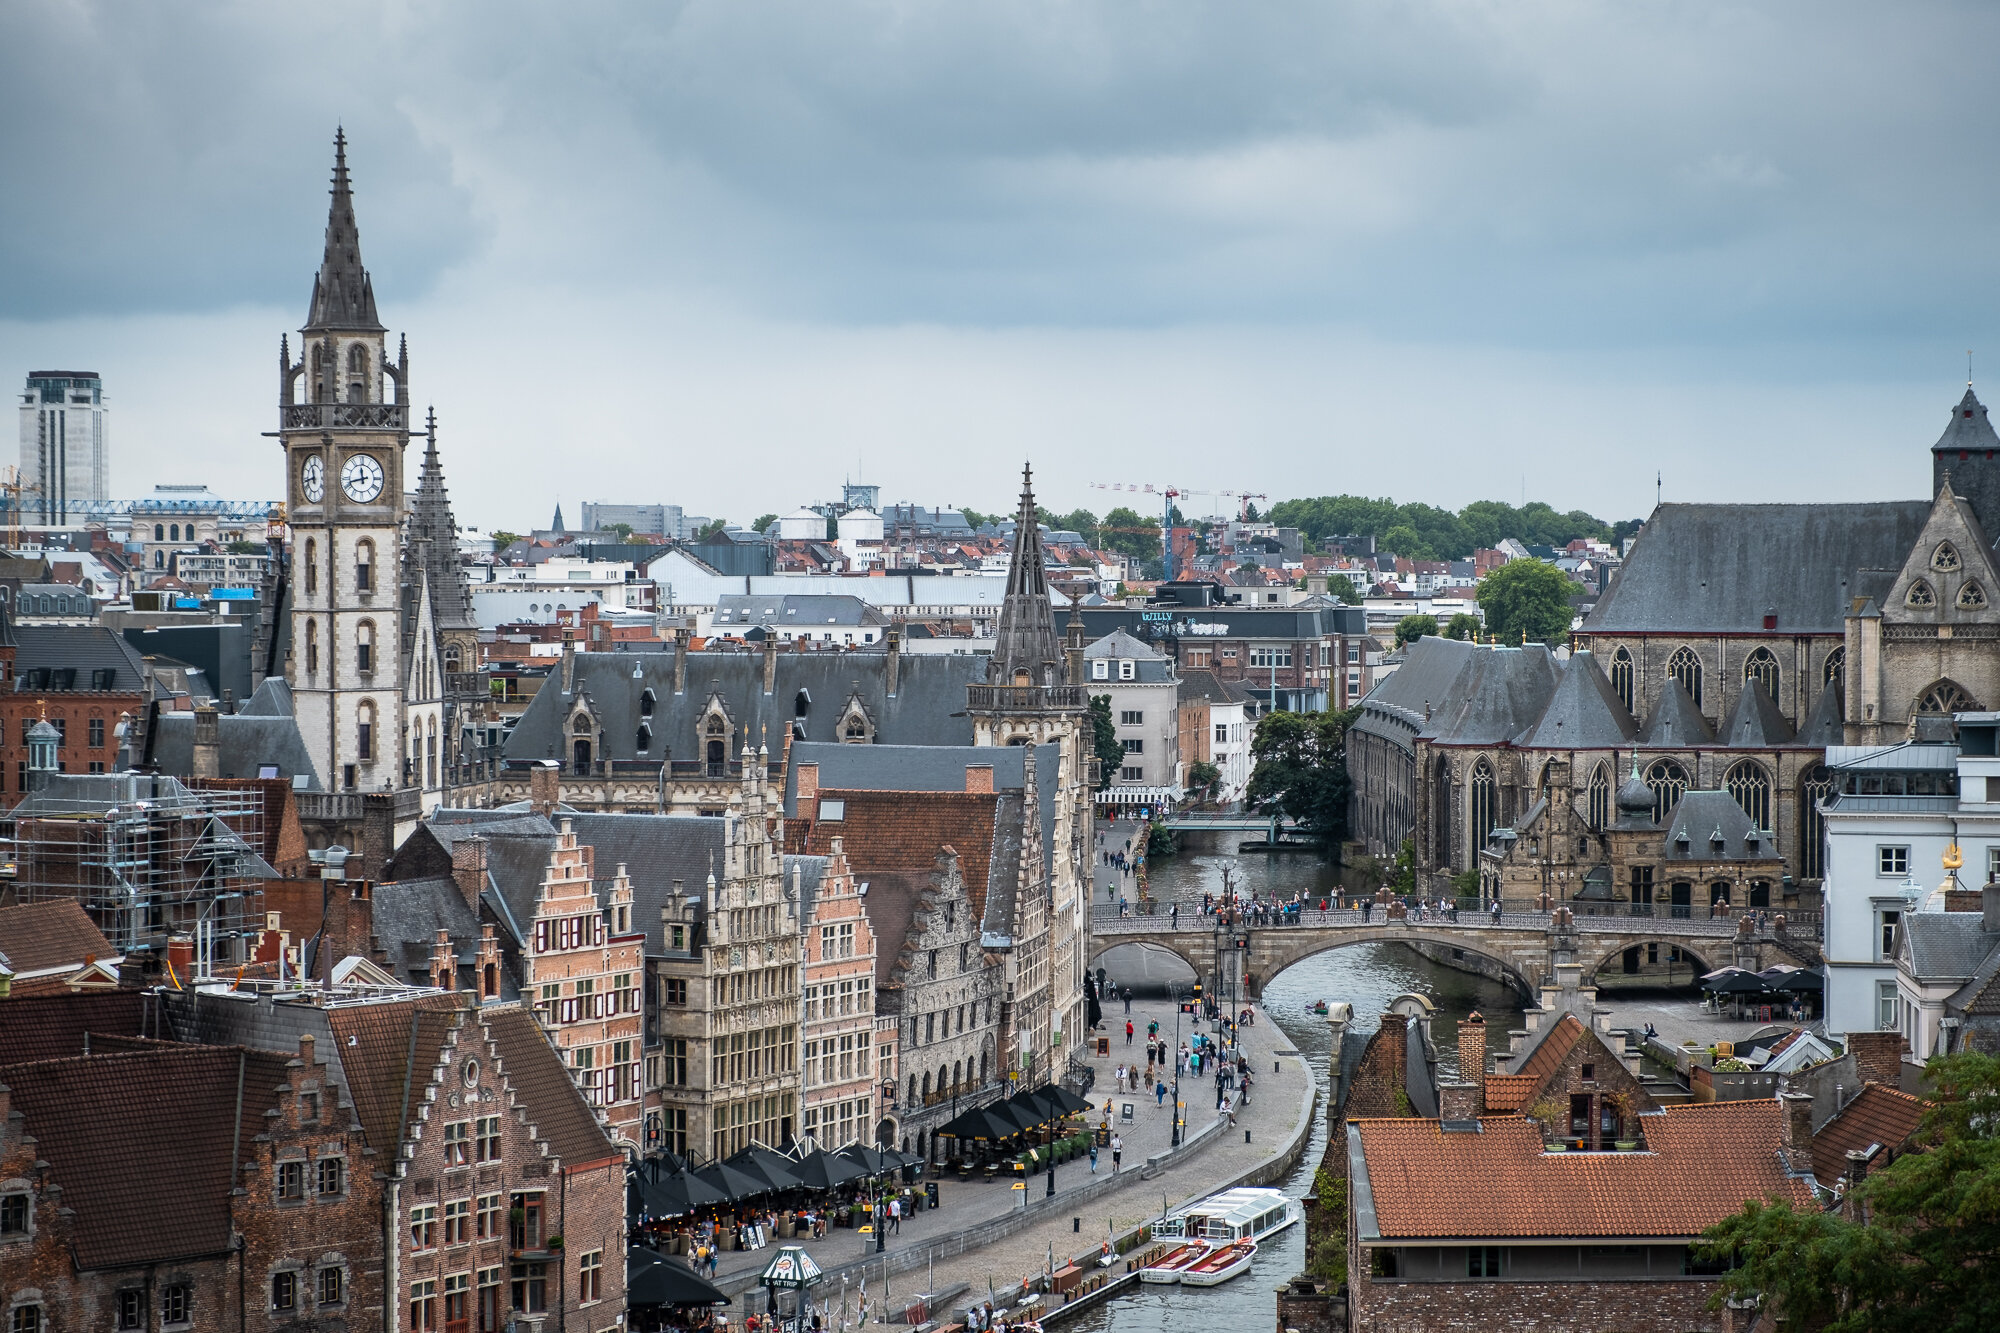 The Ghent skyline taken from Gravensteen Castle